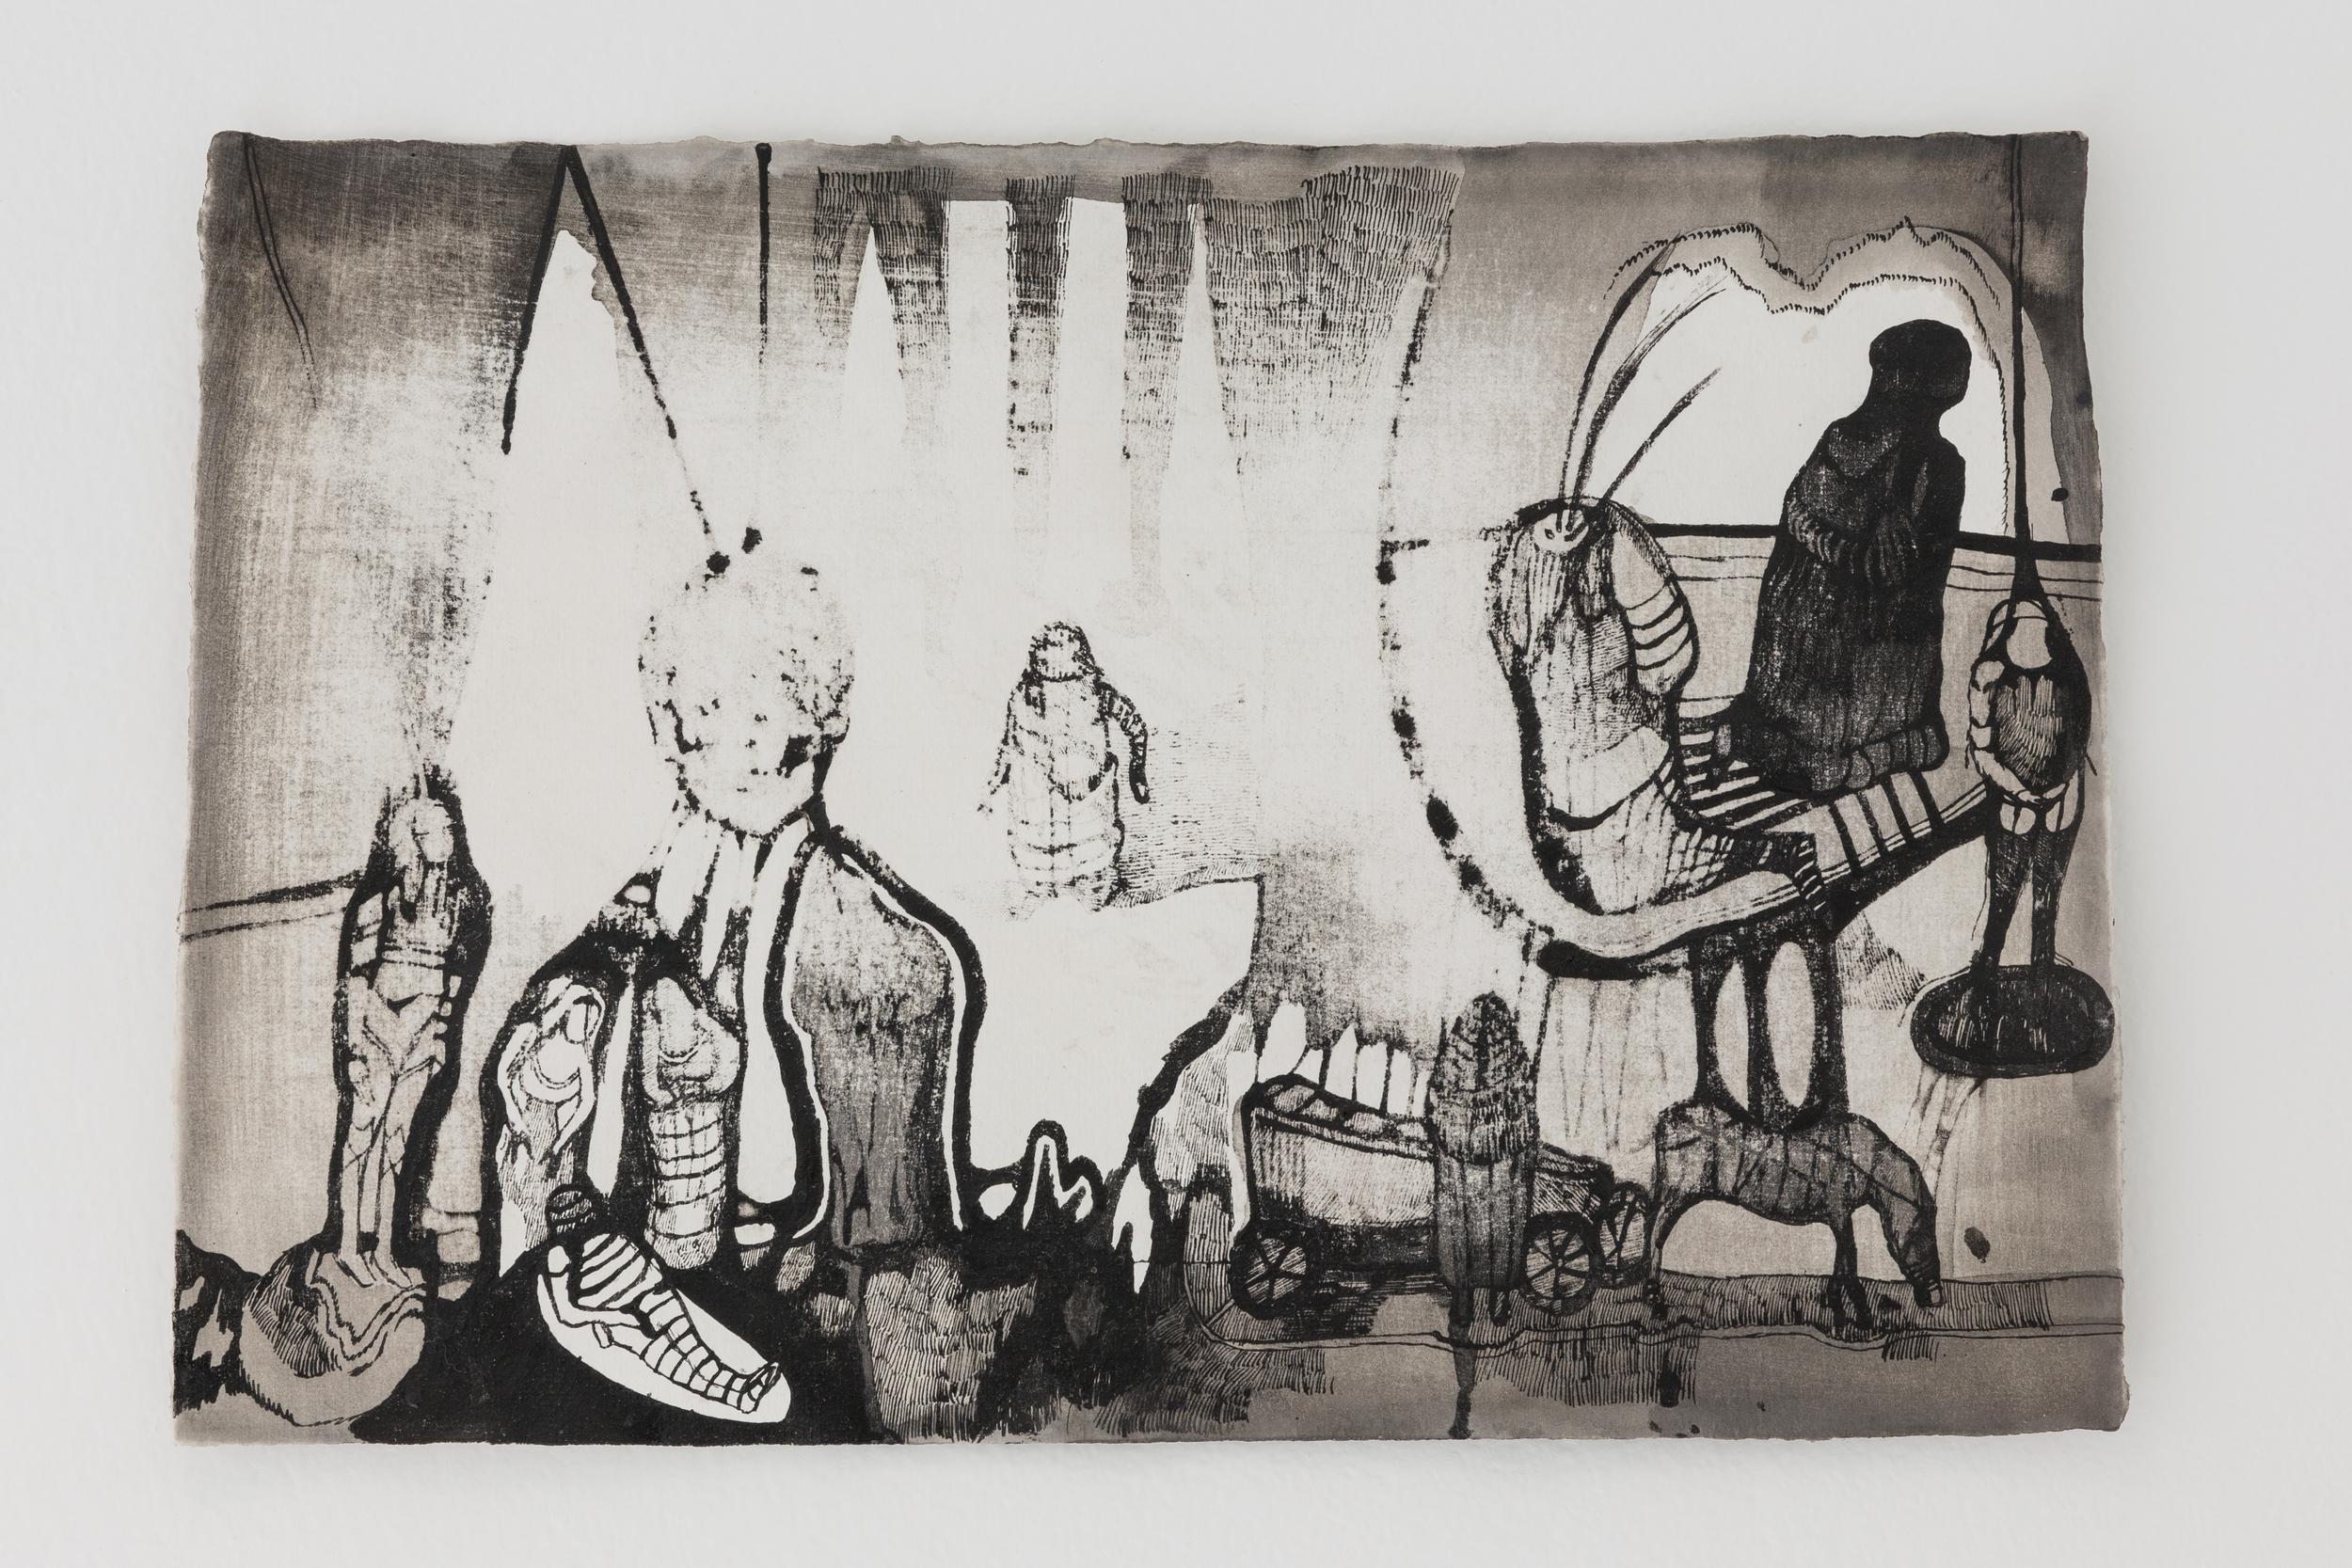 Josef Zlámal, bez názvu, 2015, tuš na ručním papíře, 23 x 42 cm